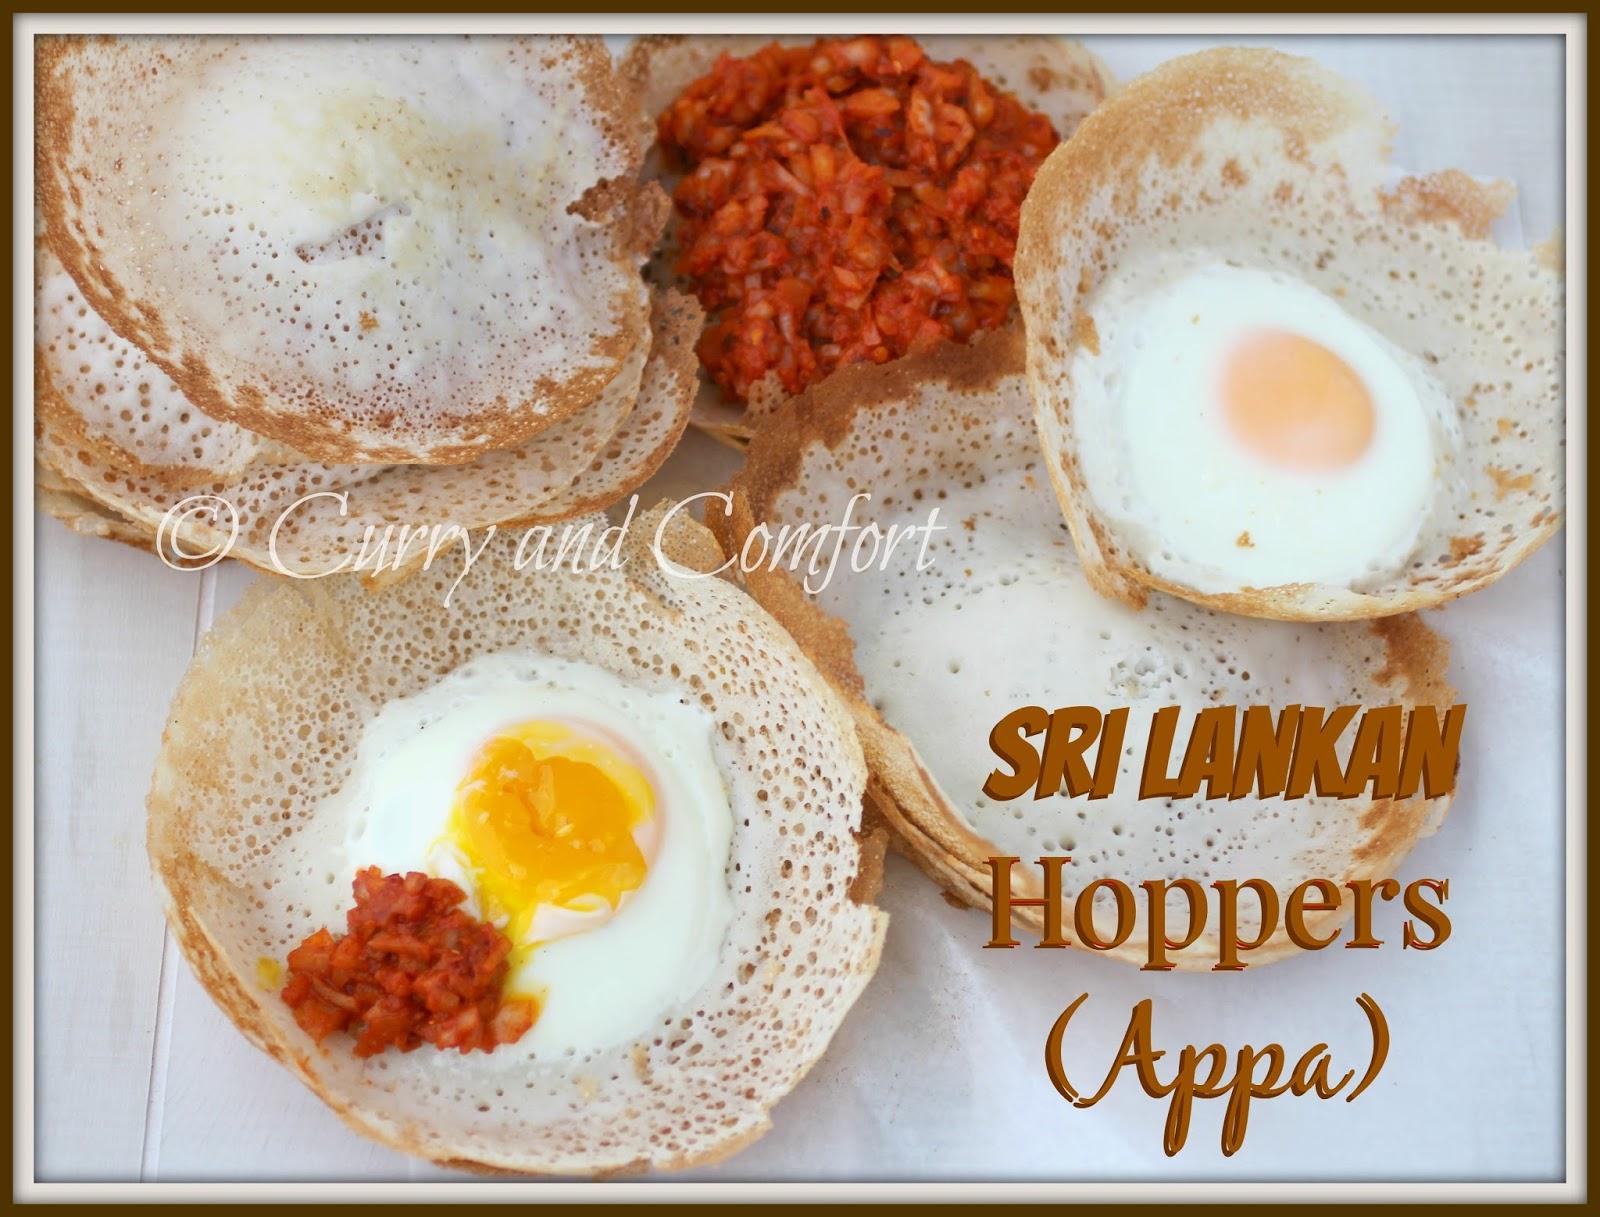 Kitchen Simmer: Sri Lankan Hoppers (Appa)